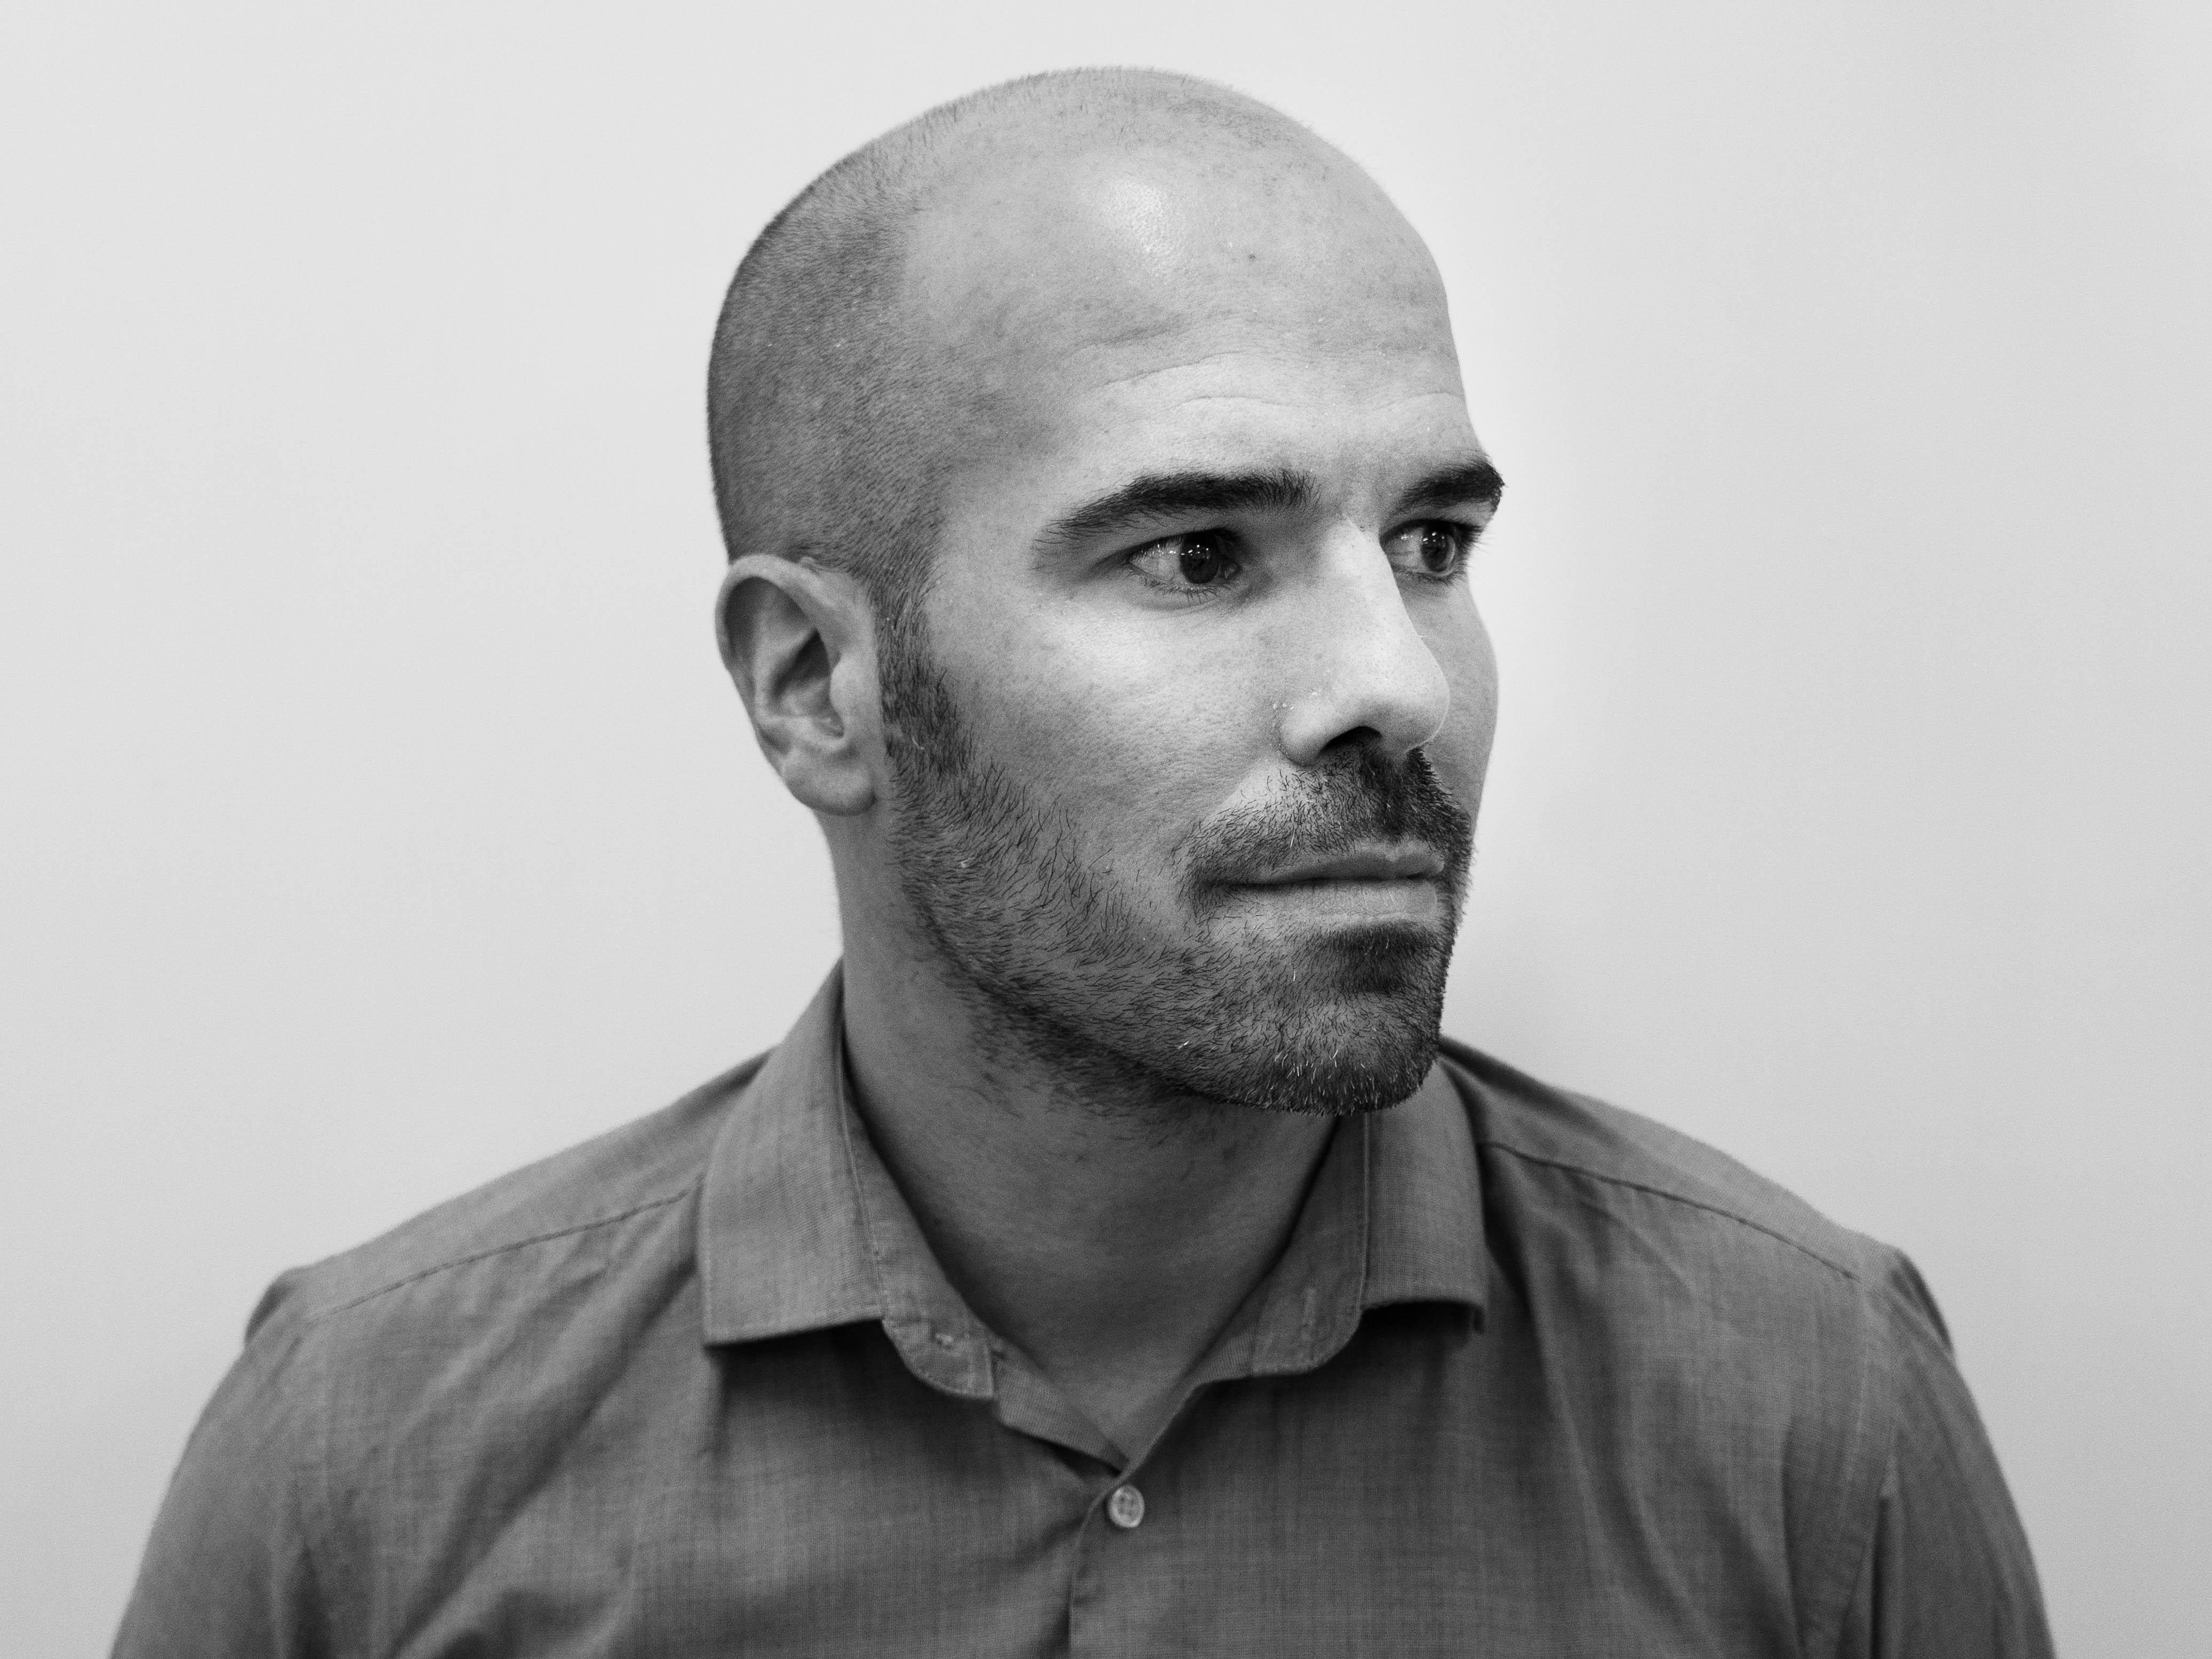 Axon Garside welcomes new Project Manager, Samuel Garrido!